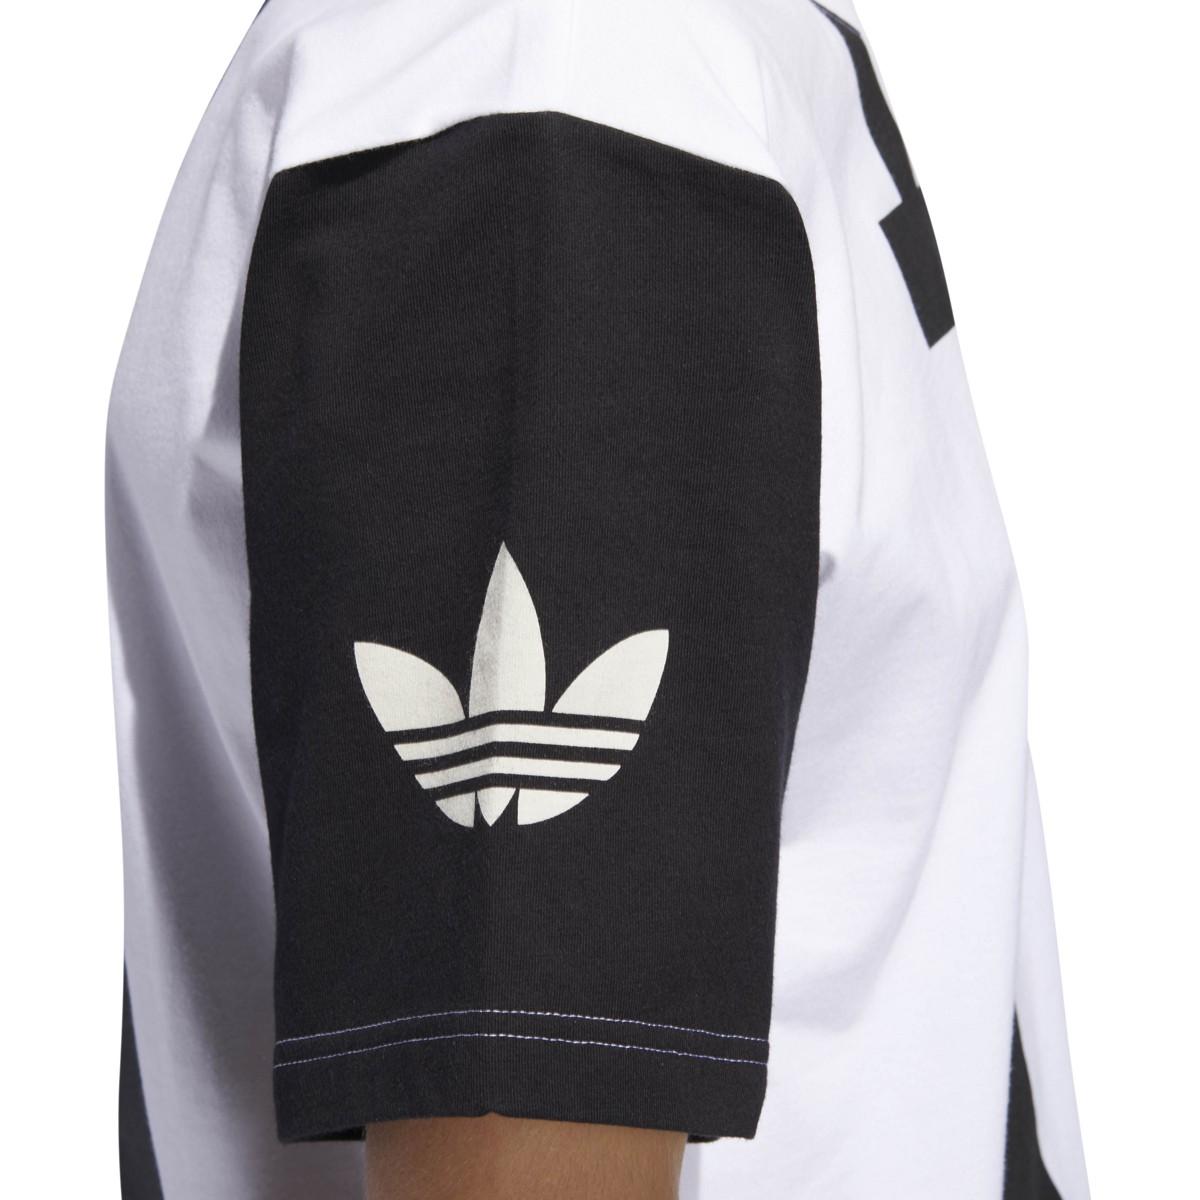 Details about Adidas Men's Originals Big Adi Tee Black White DY6653